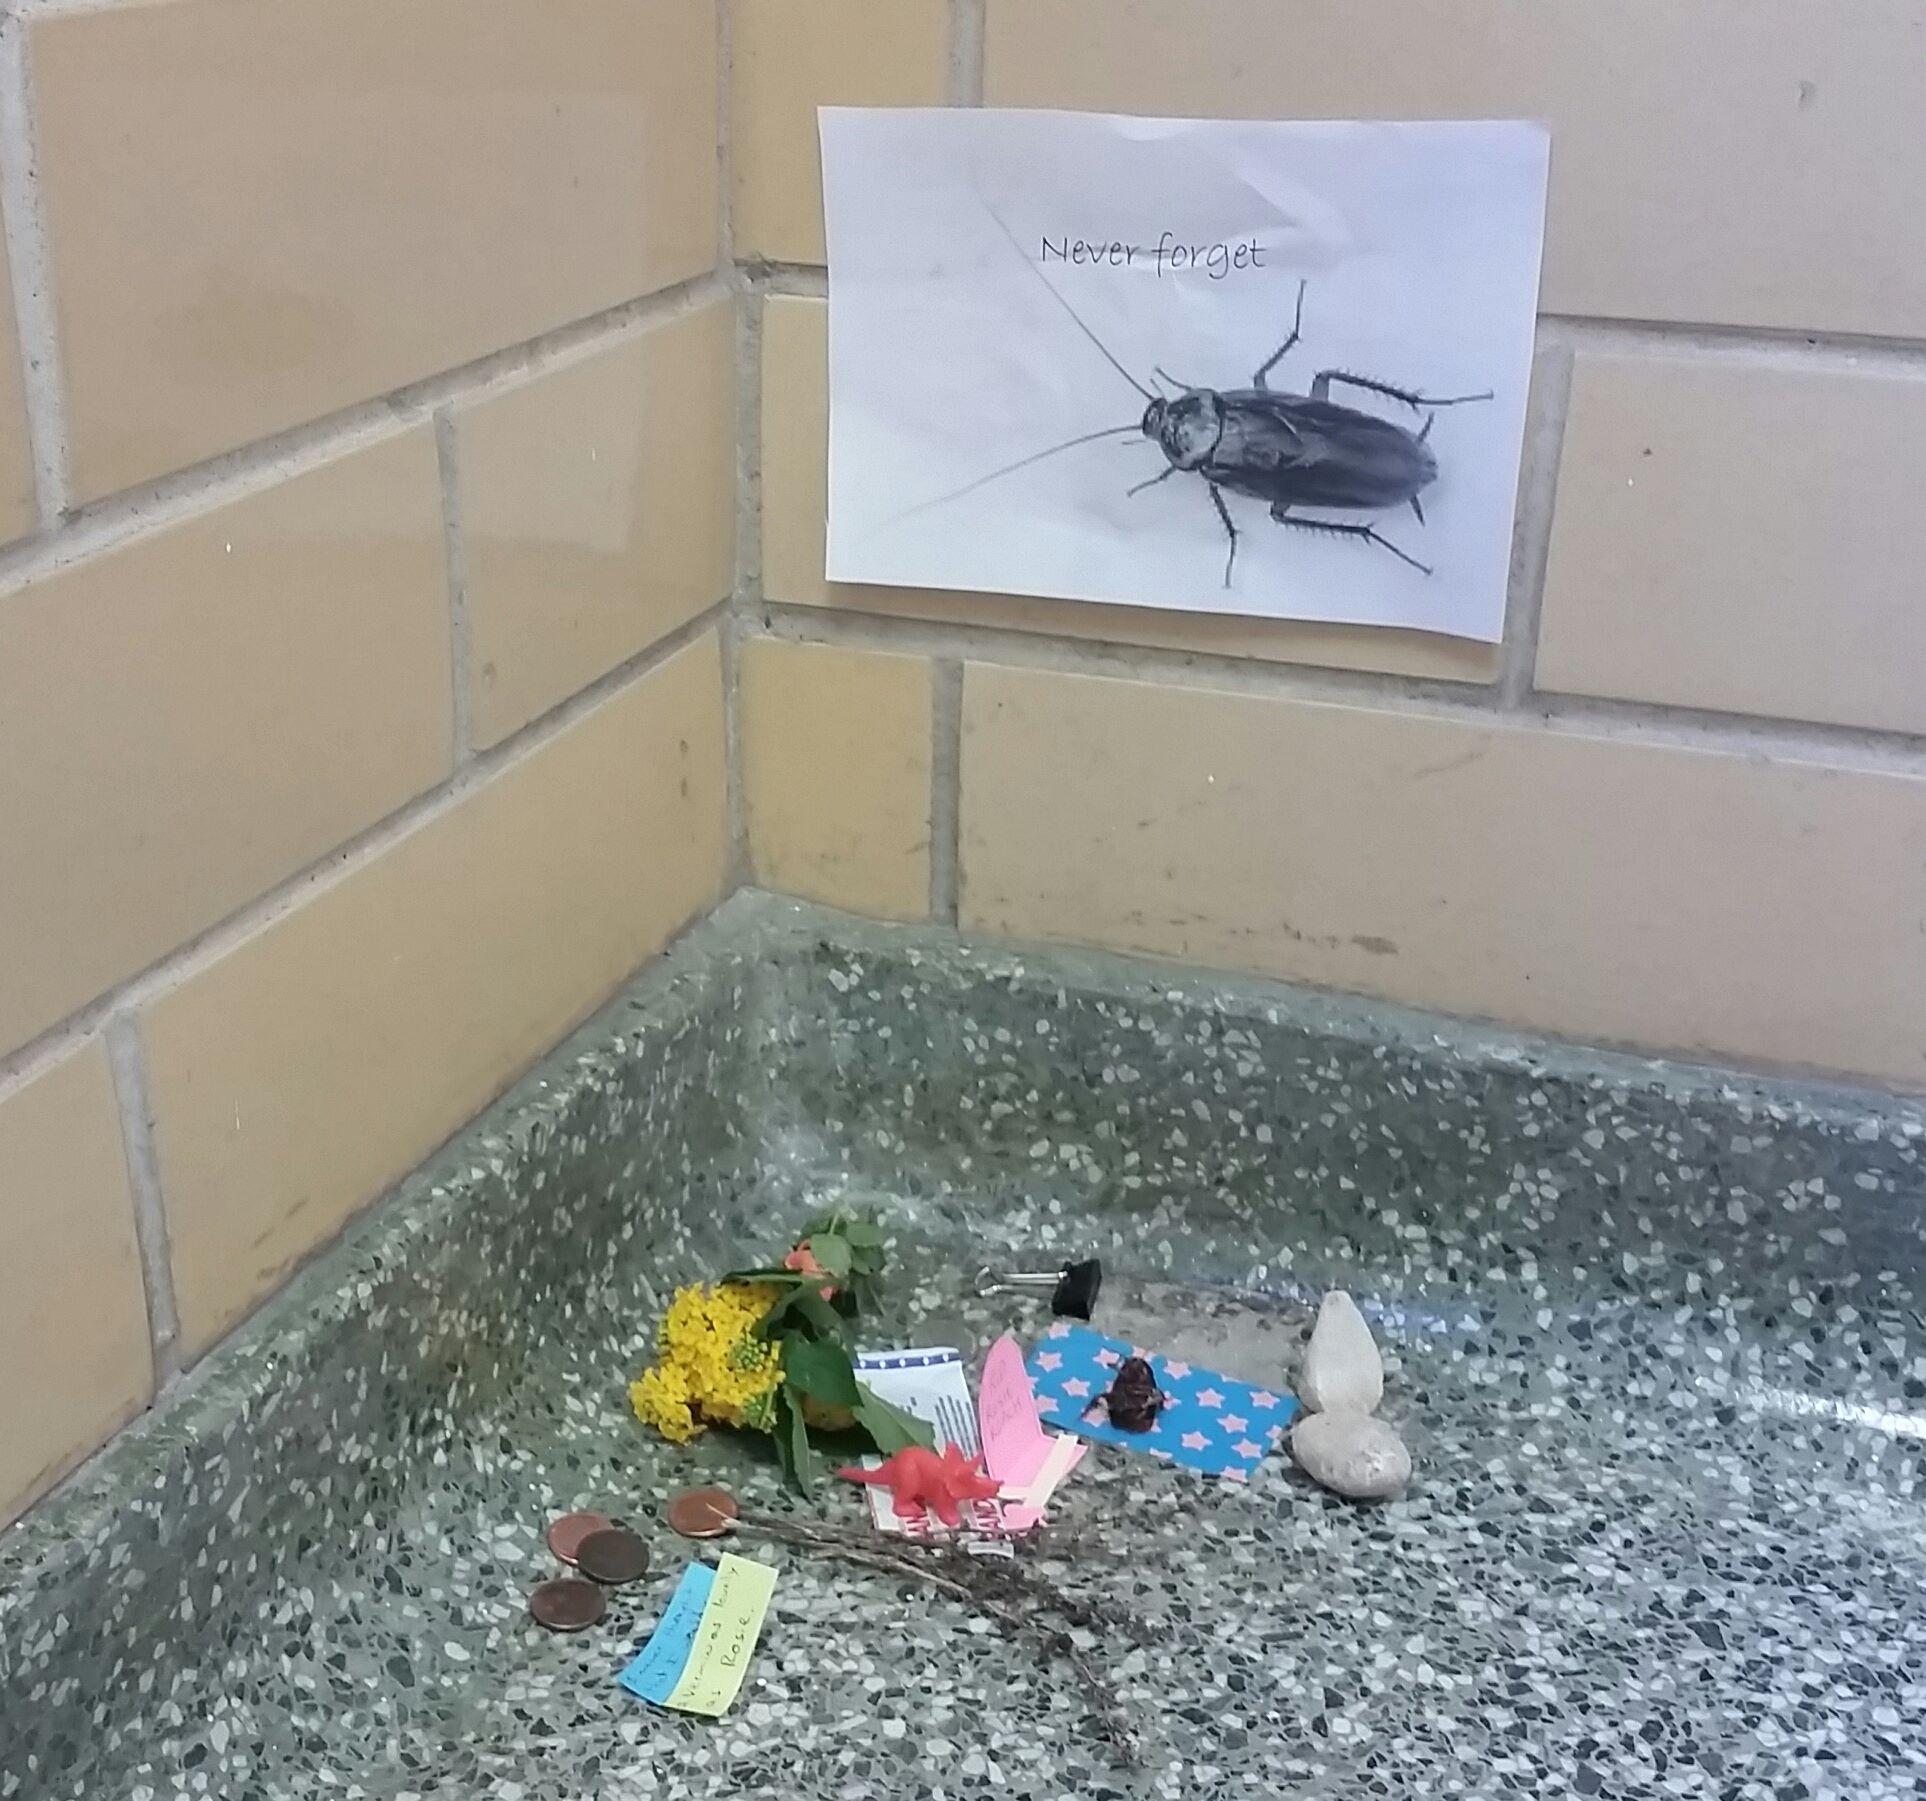 cucarachas 3